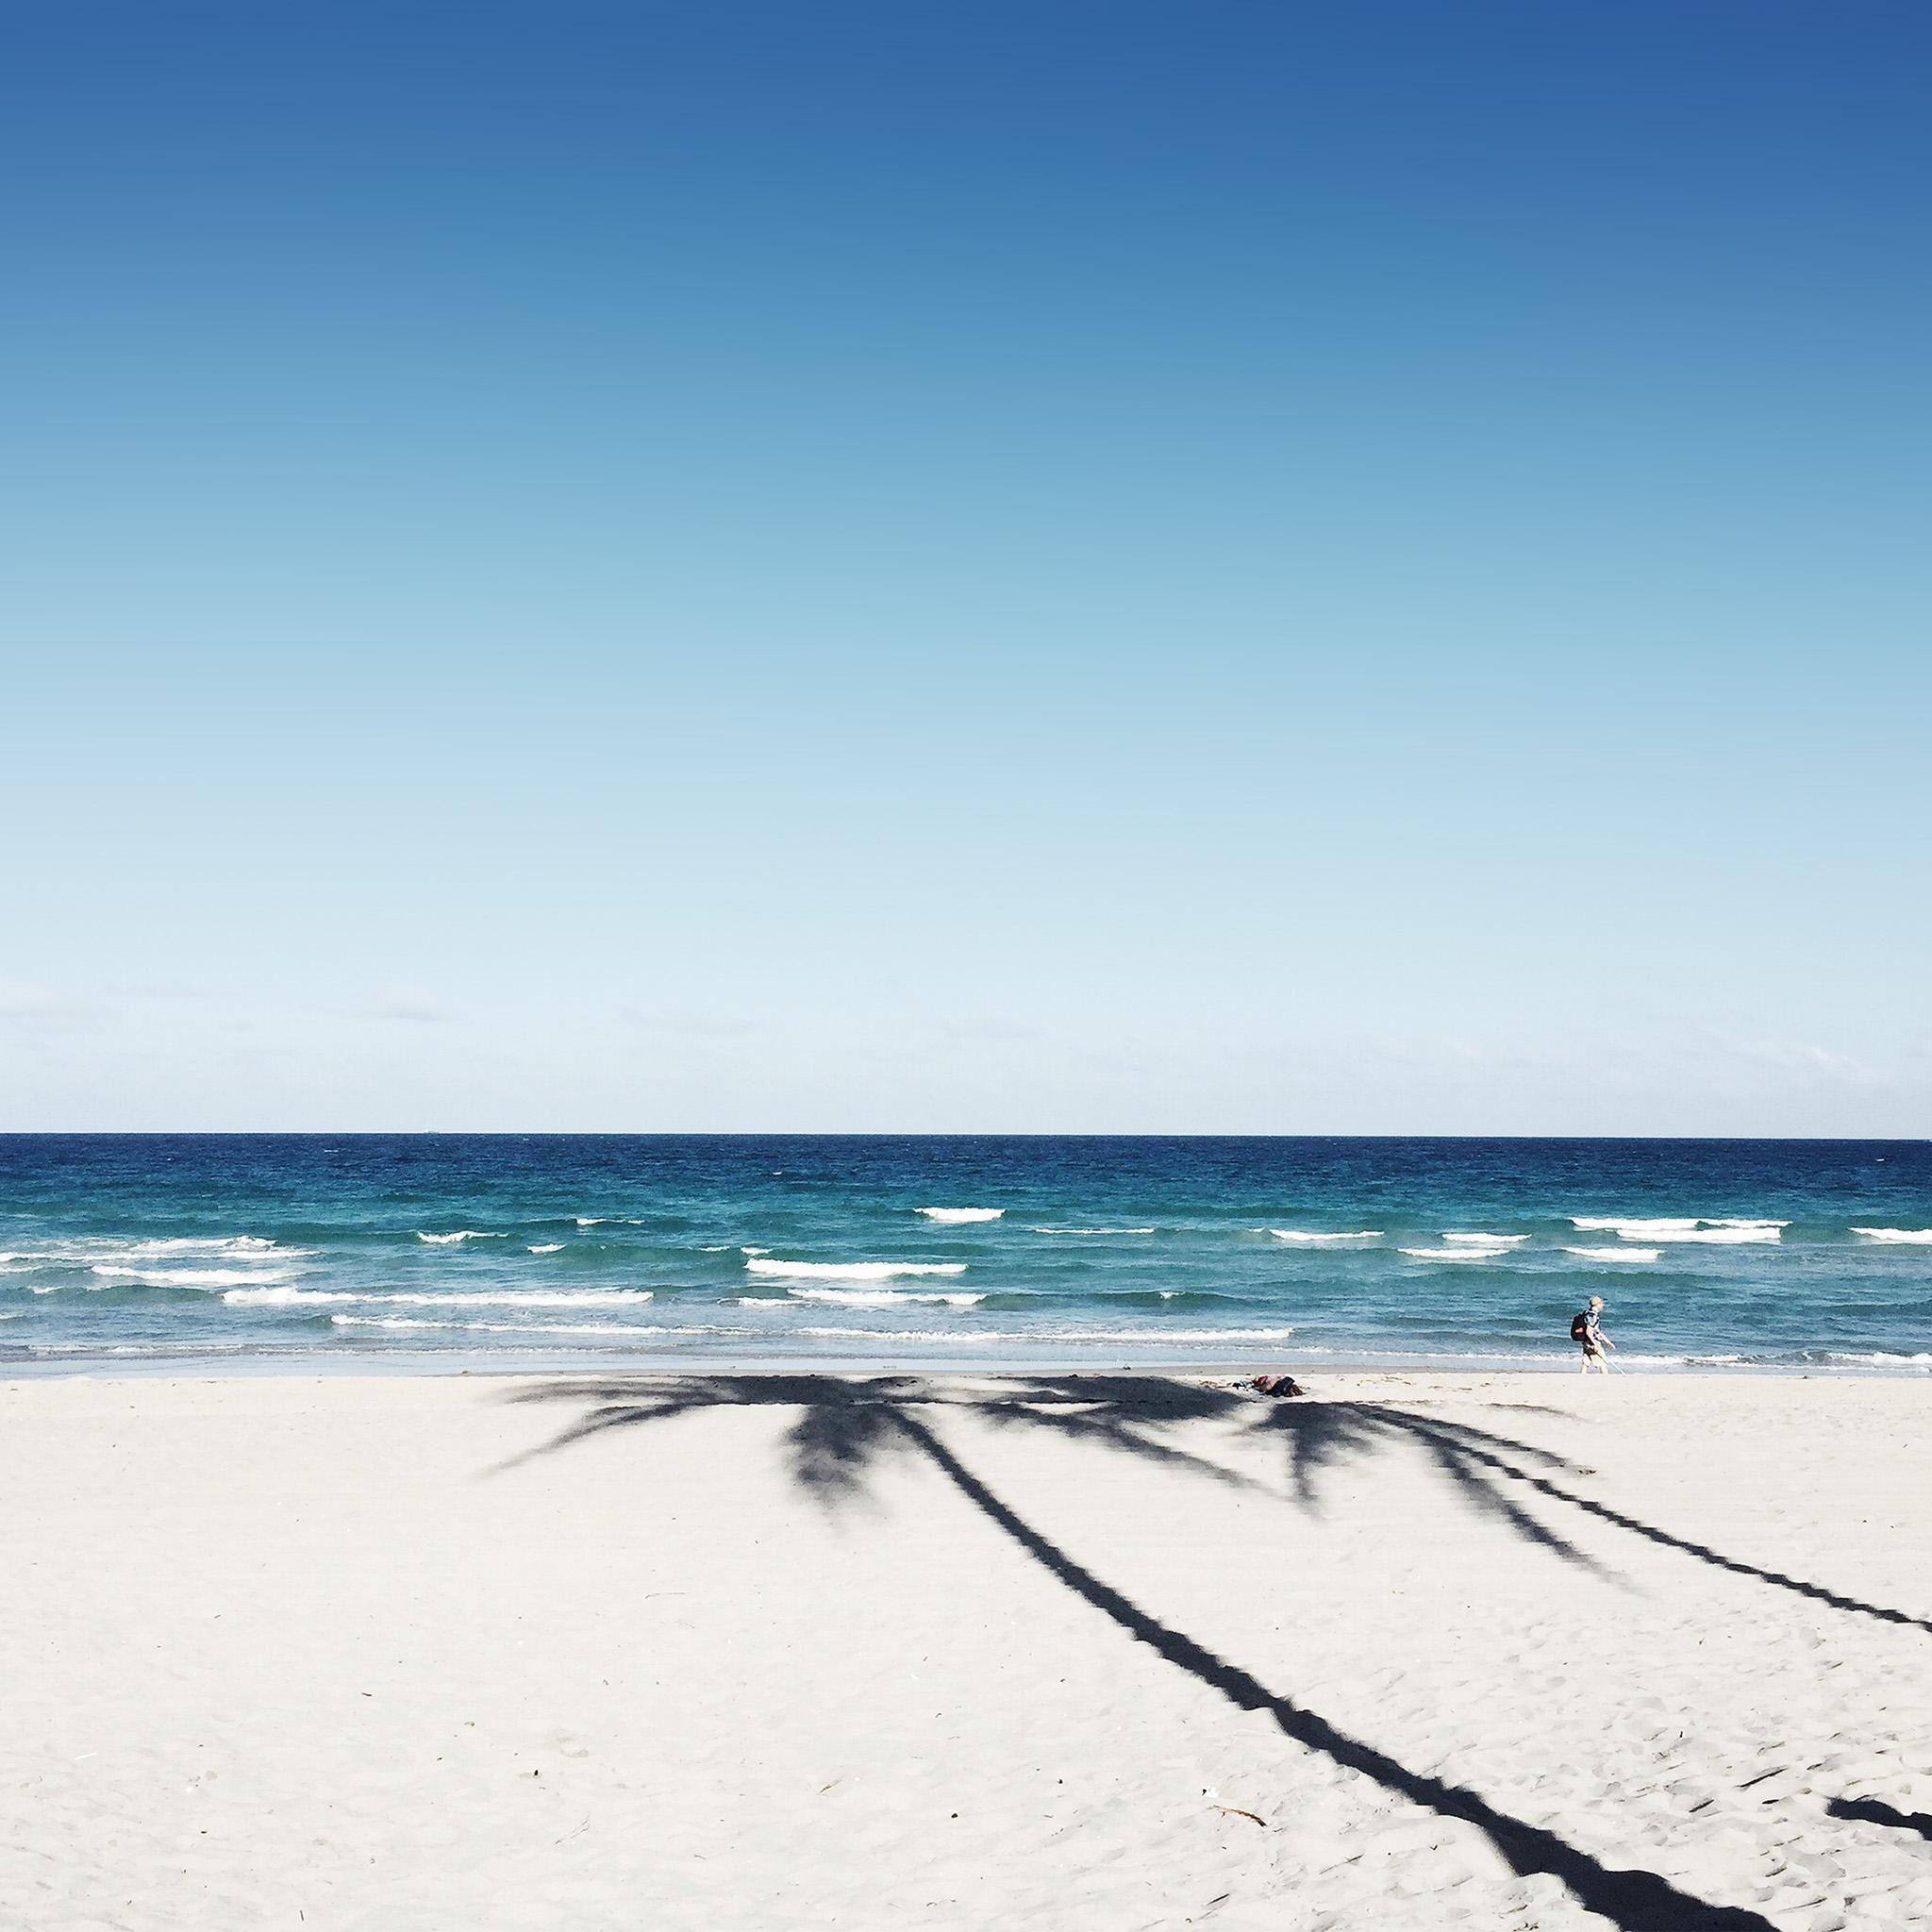 Mx38-beach-blue-nature-sea-holiday-water-sky